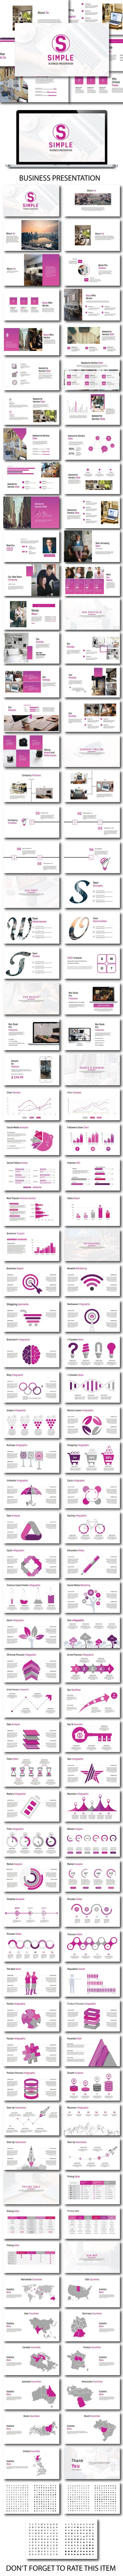 Simple Multipurpose Google Slide - Google Slides Presentation Templates